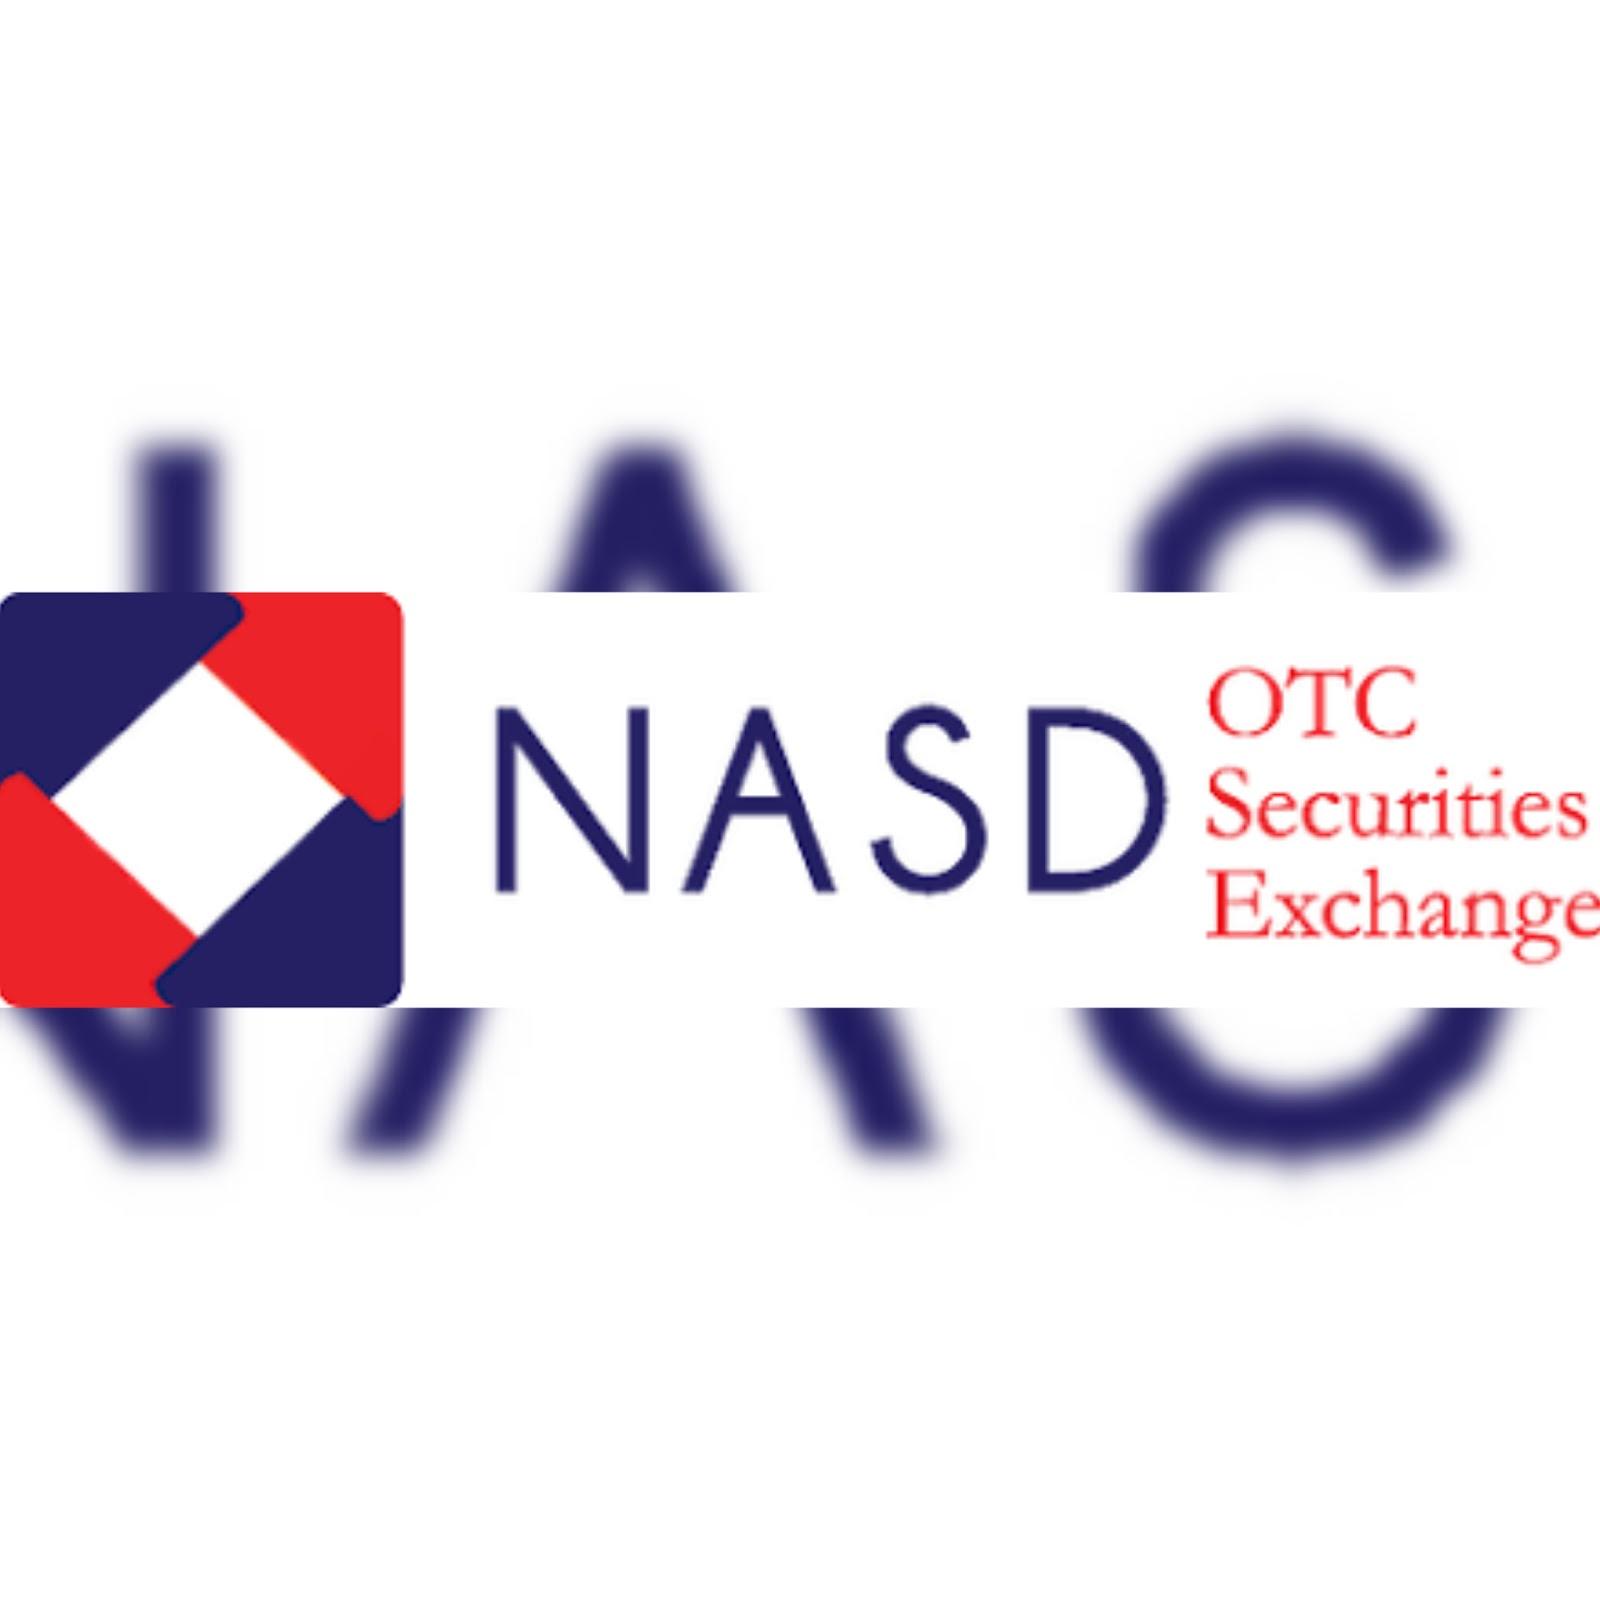 NASD OTC grows value to N525.59bn amid pandemic